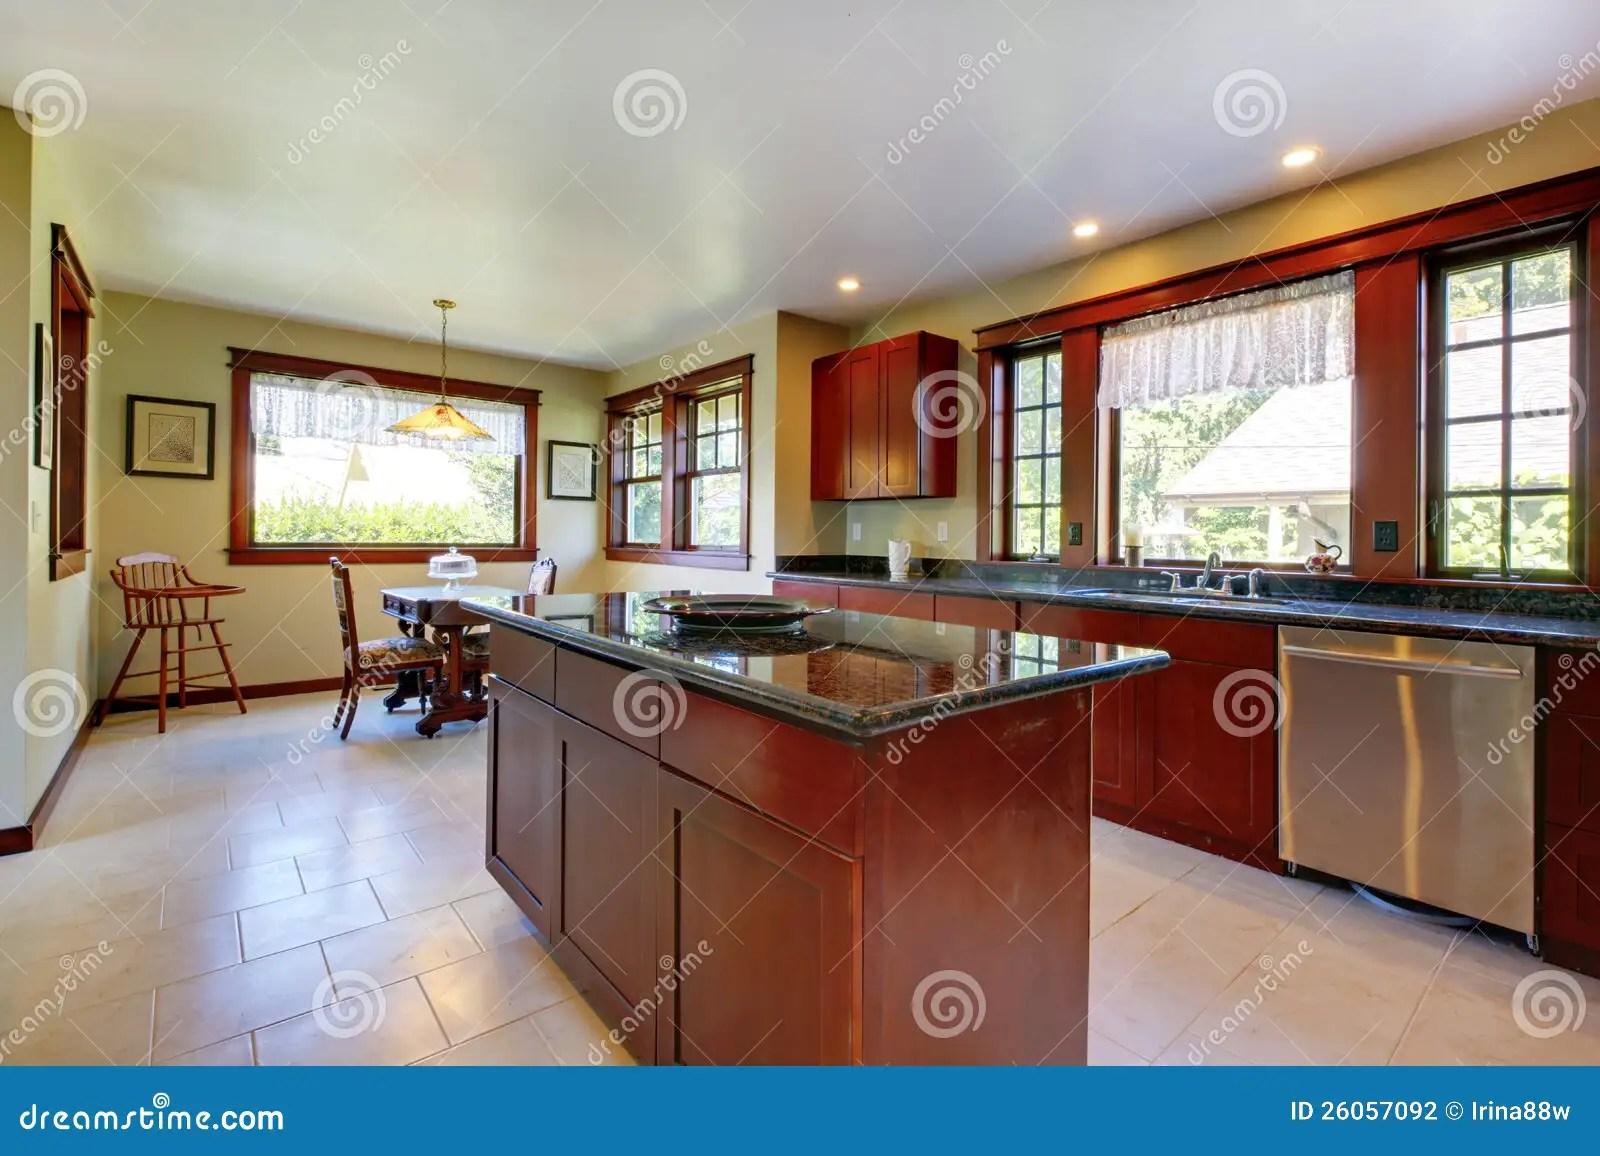 stock photography kitchen island dark wood floor image wood floor in kitchen Kitchen with island and dark wood floor